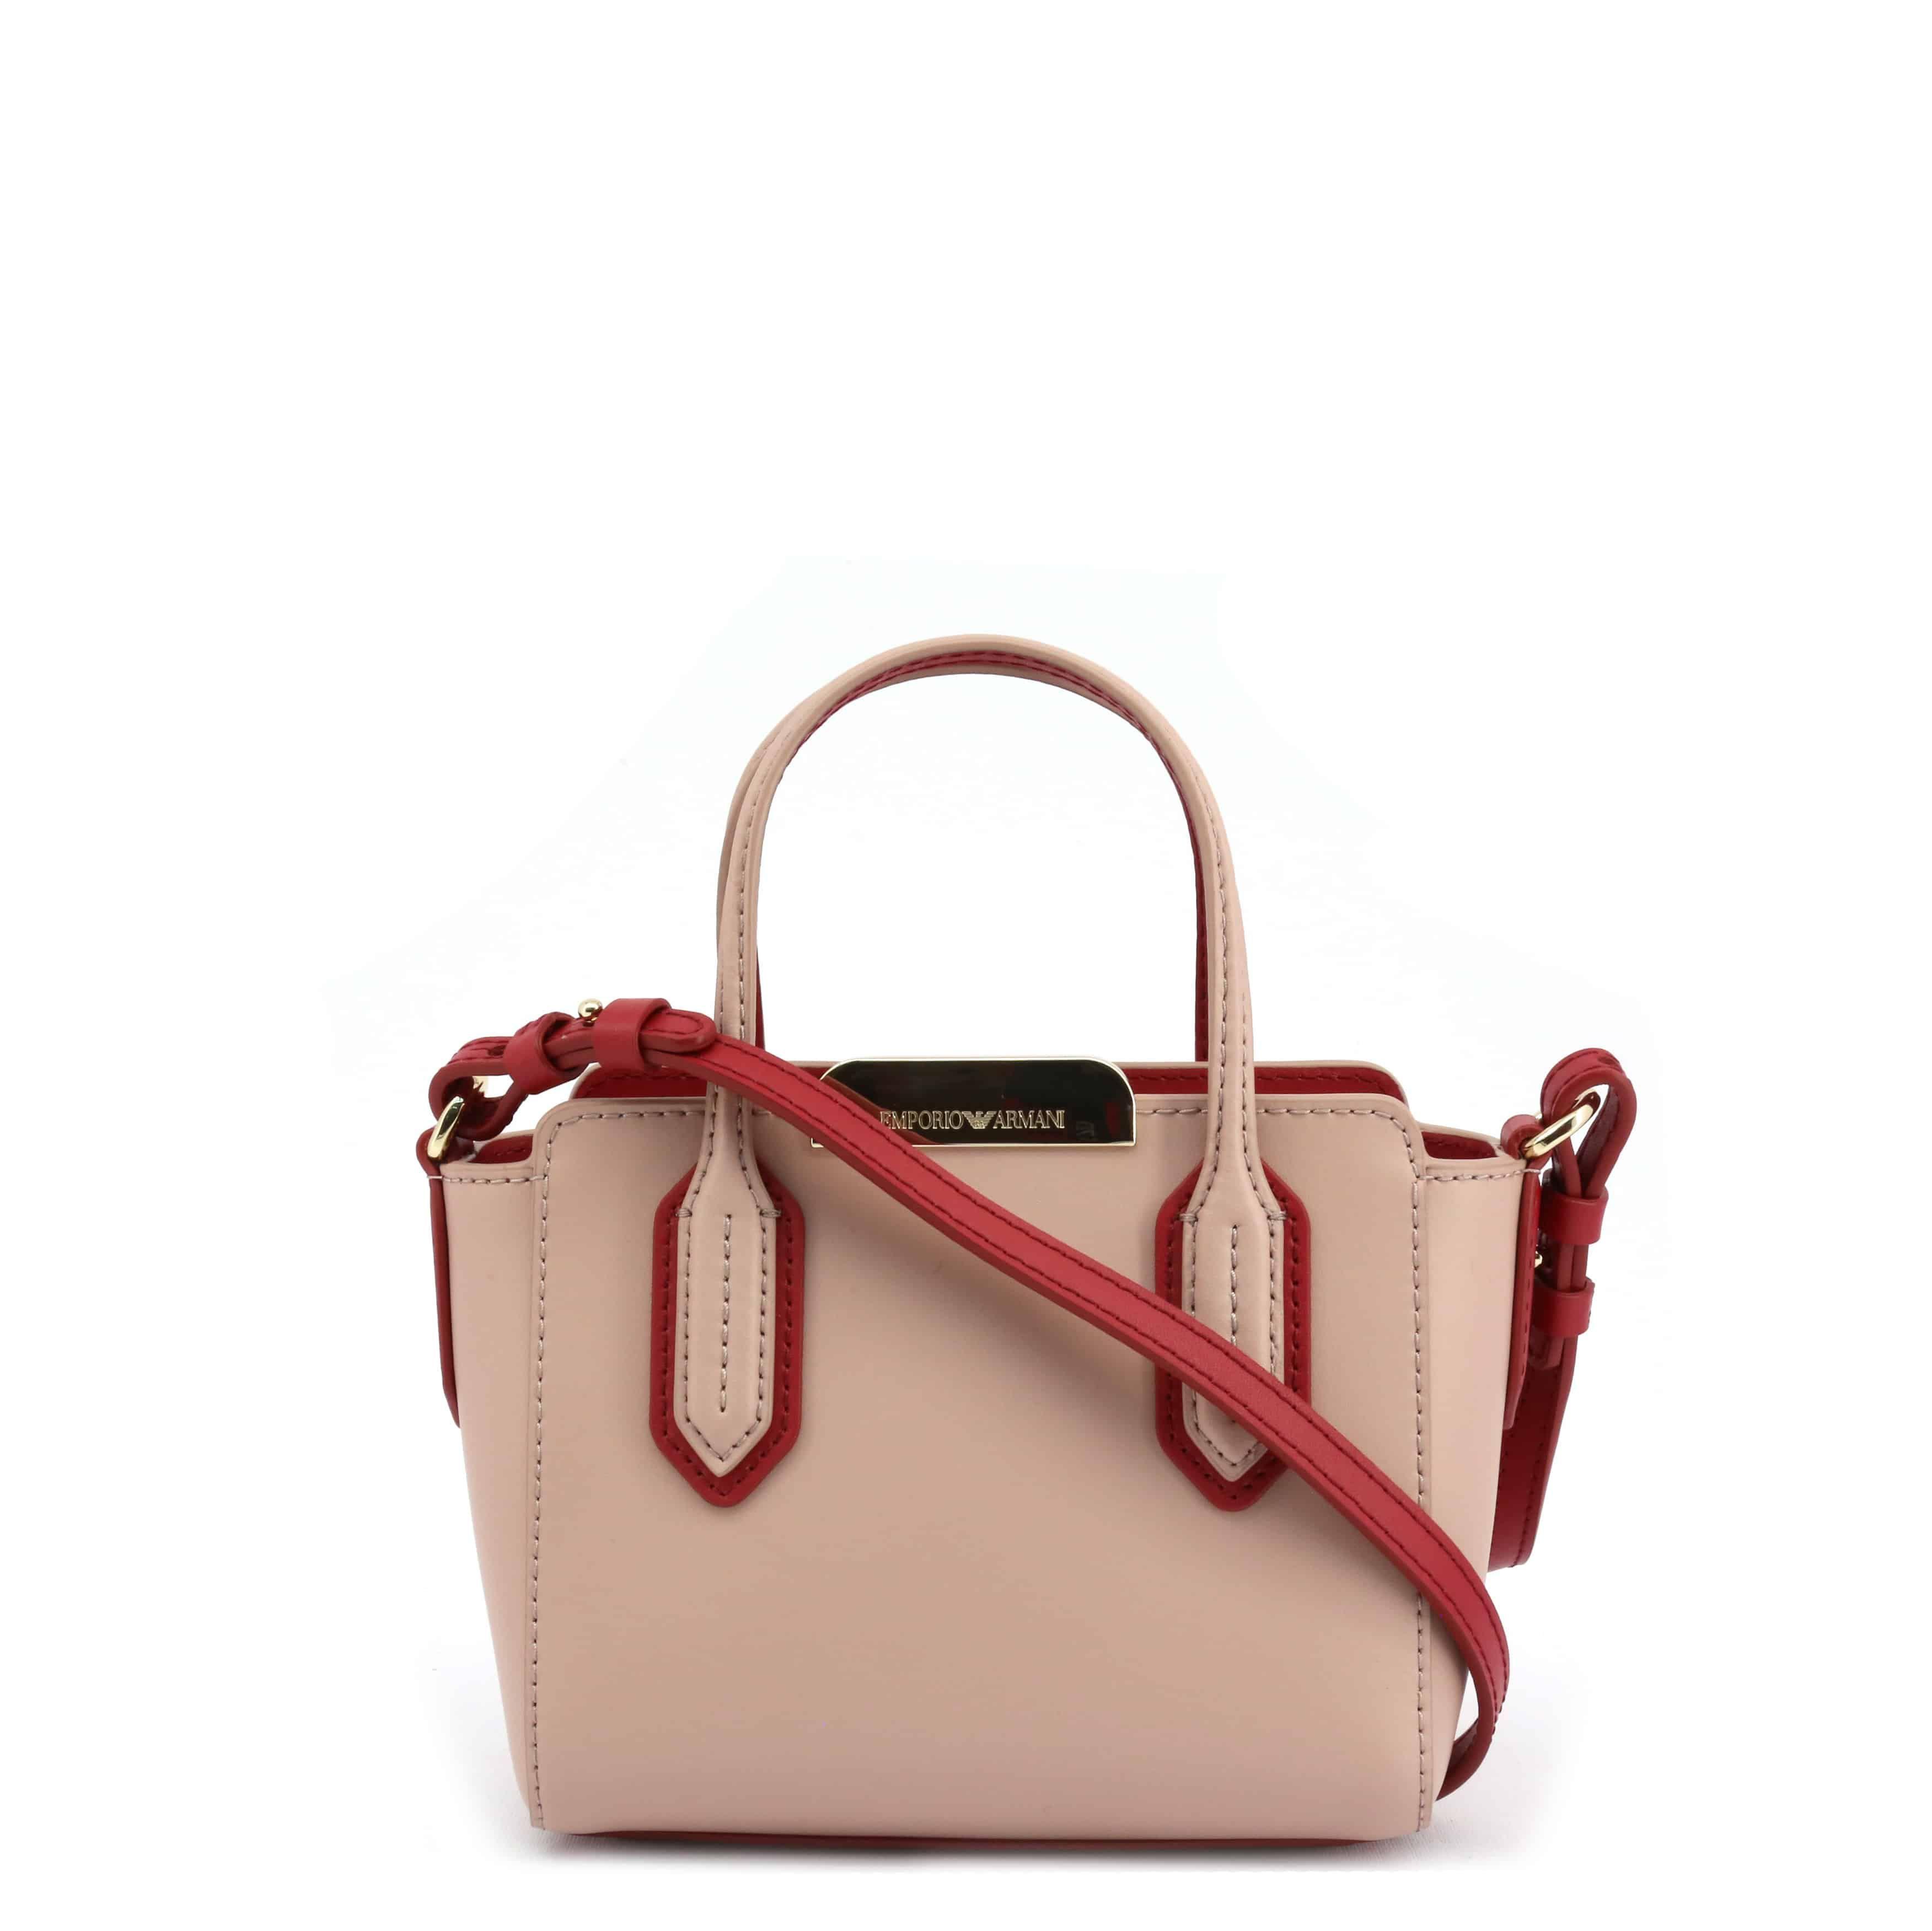 Emporio Armani – Y3B099_YDT6A – Roze Designeritems.nl